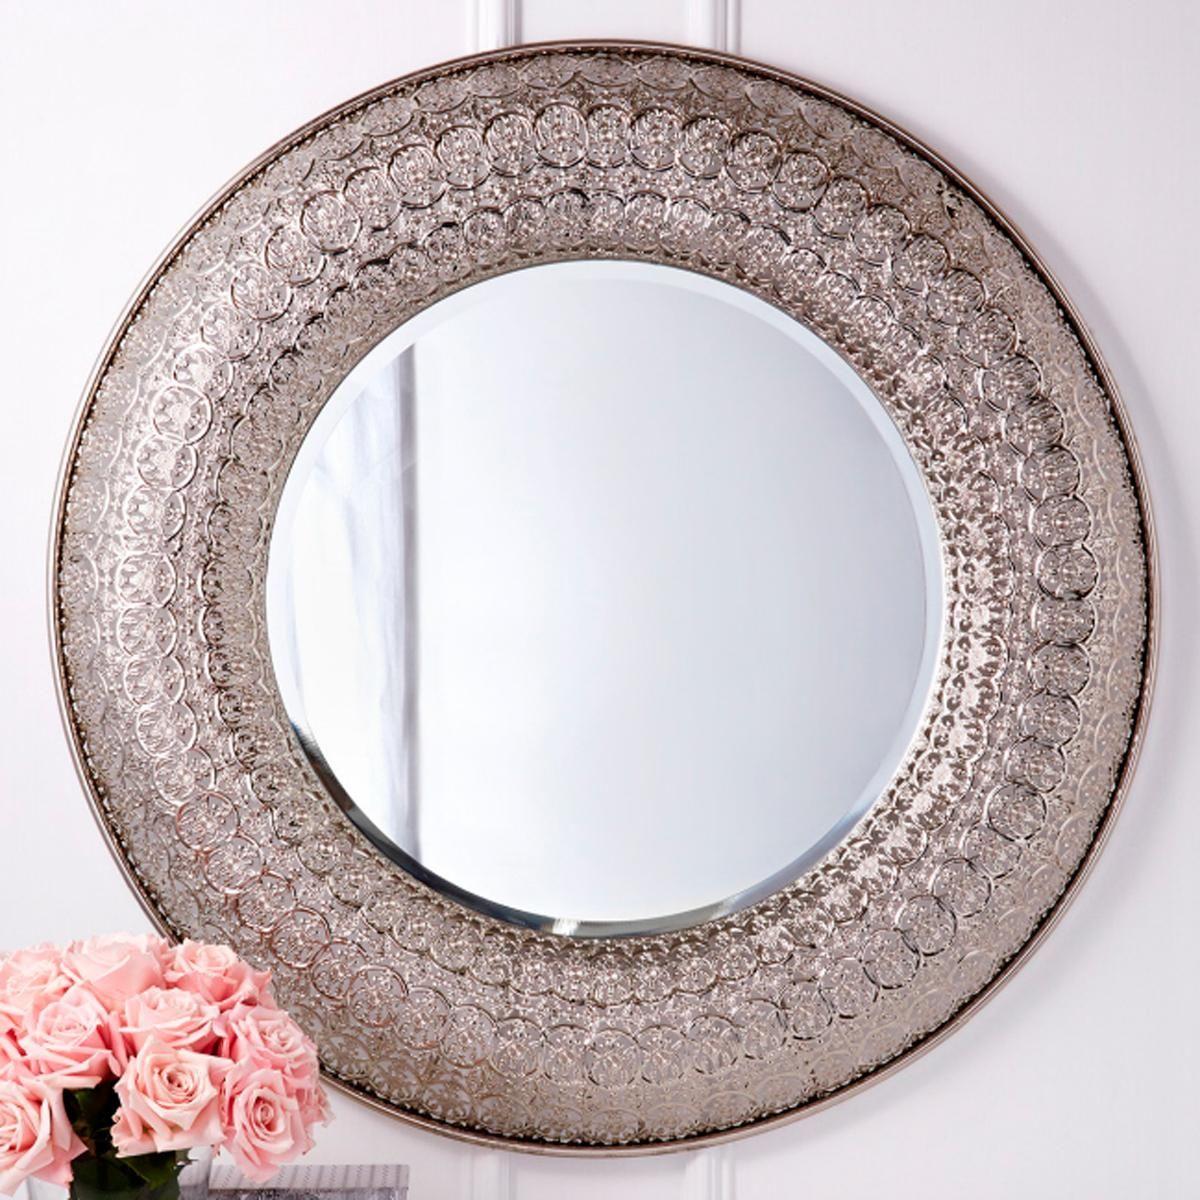 Silver Filigree Round Wall Mirror Shades Of Light Mirror Wall Mirror Wall Decor Round Wall Mirror